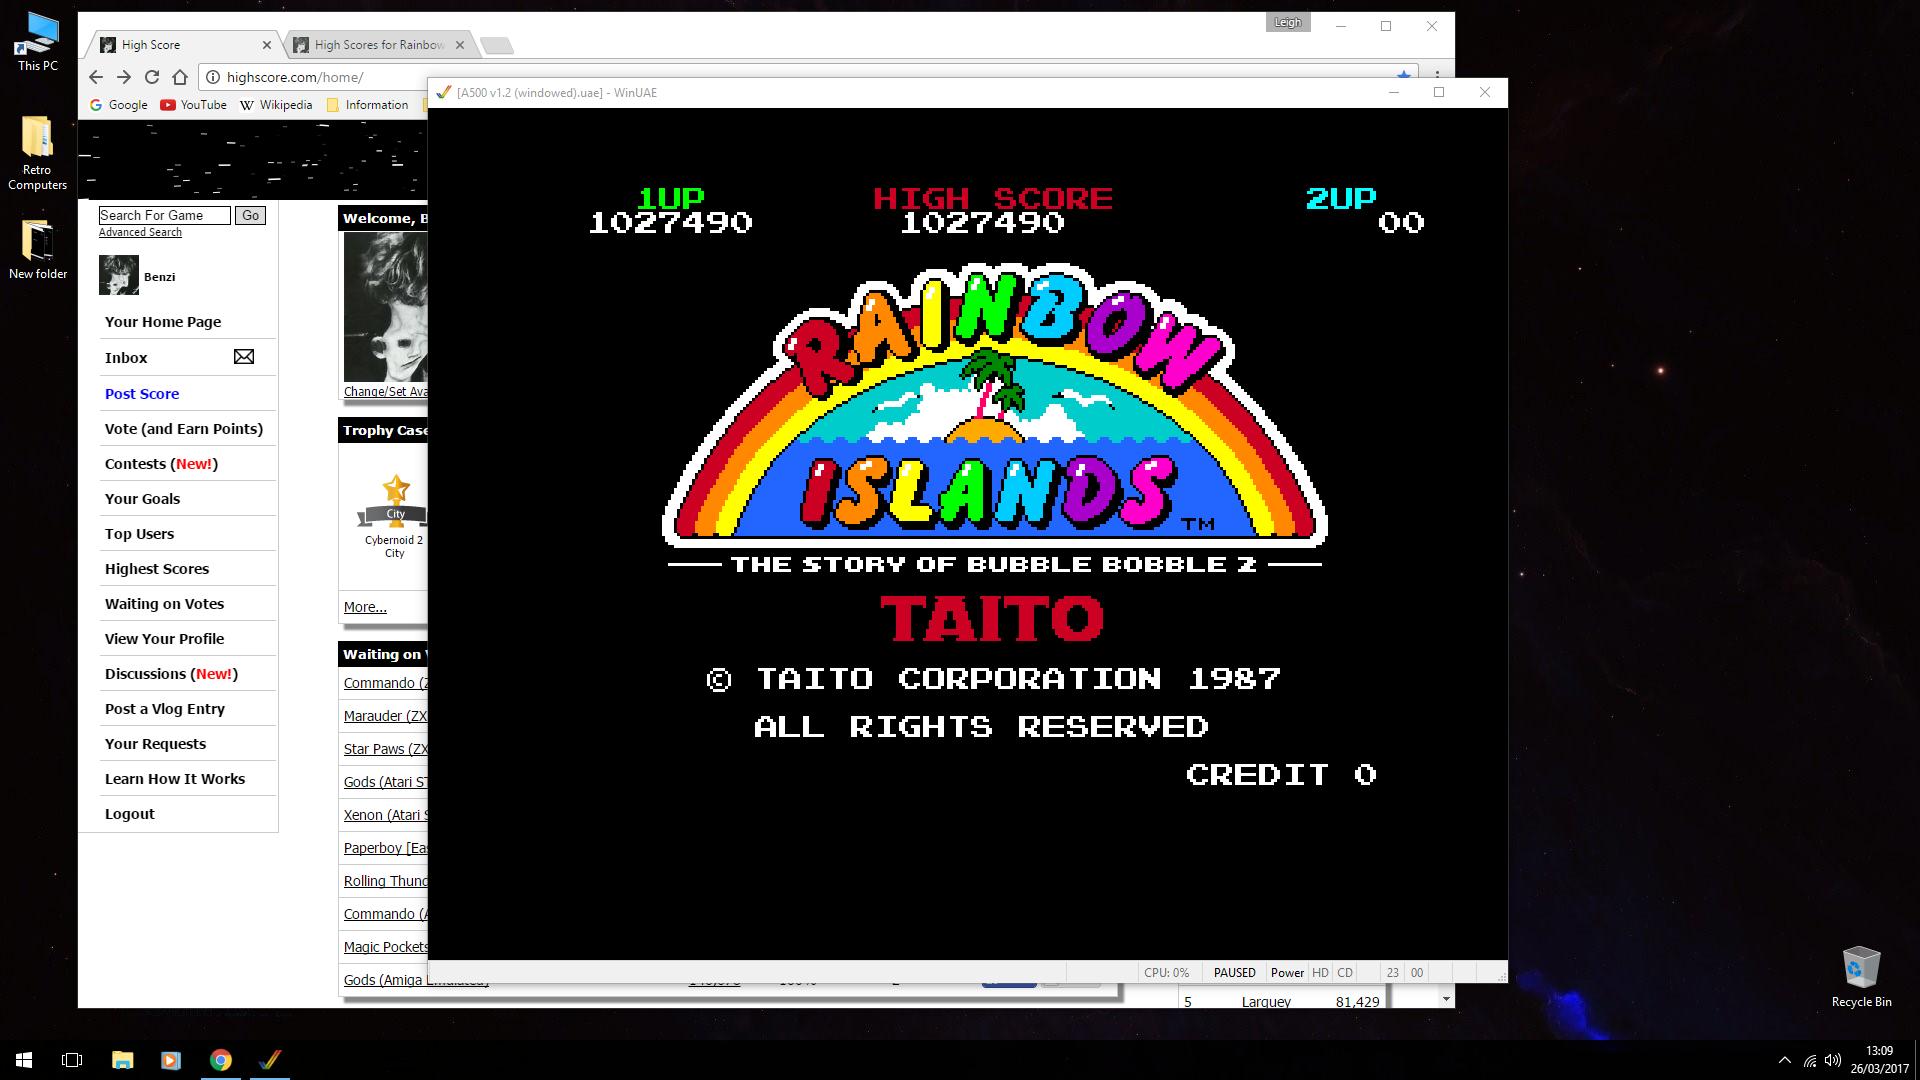 Rainbow Islands 1,027,490 points